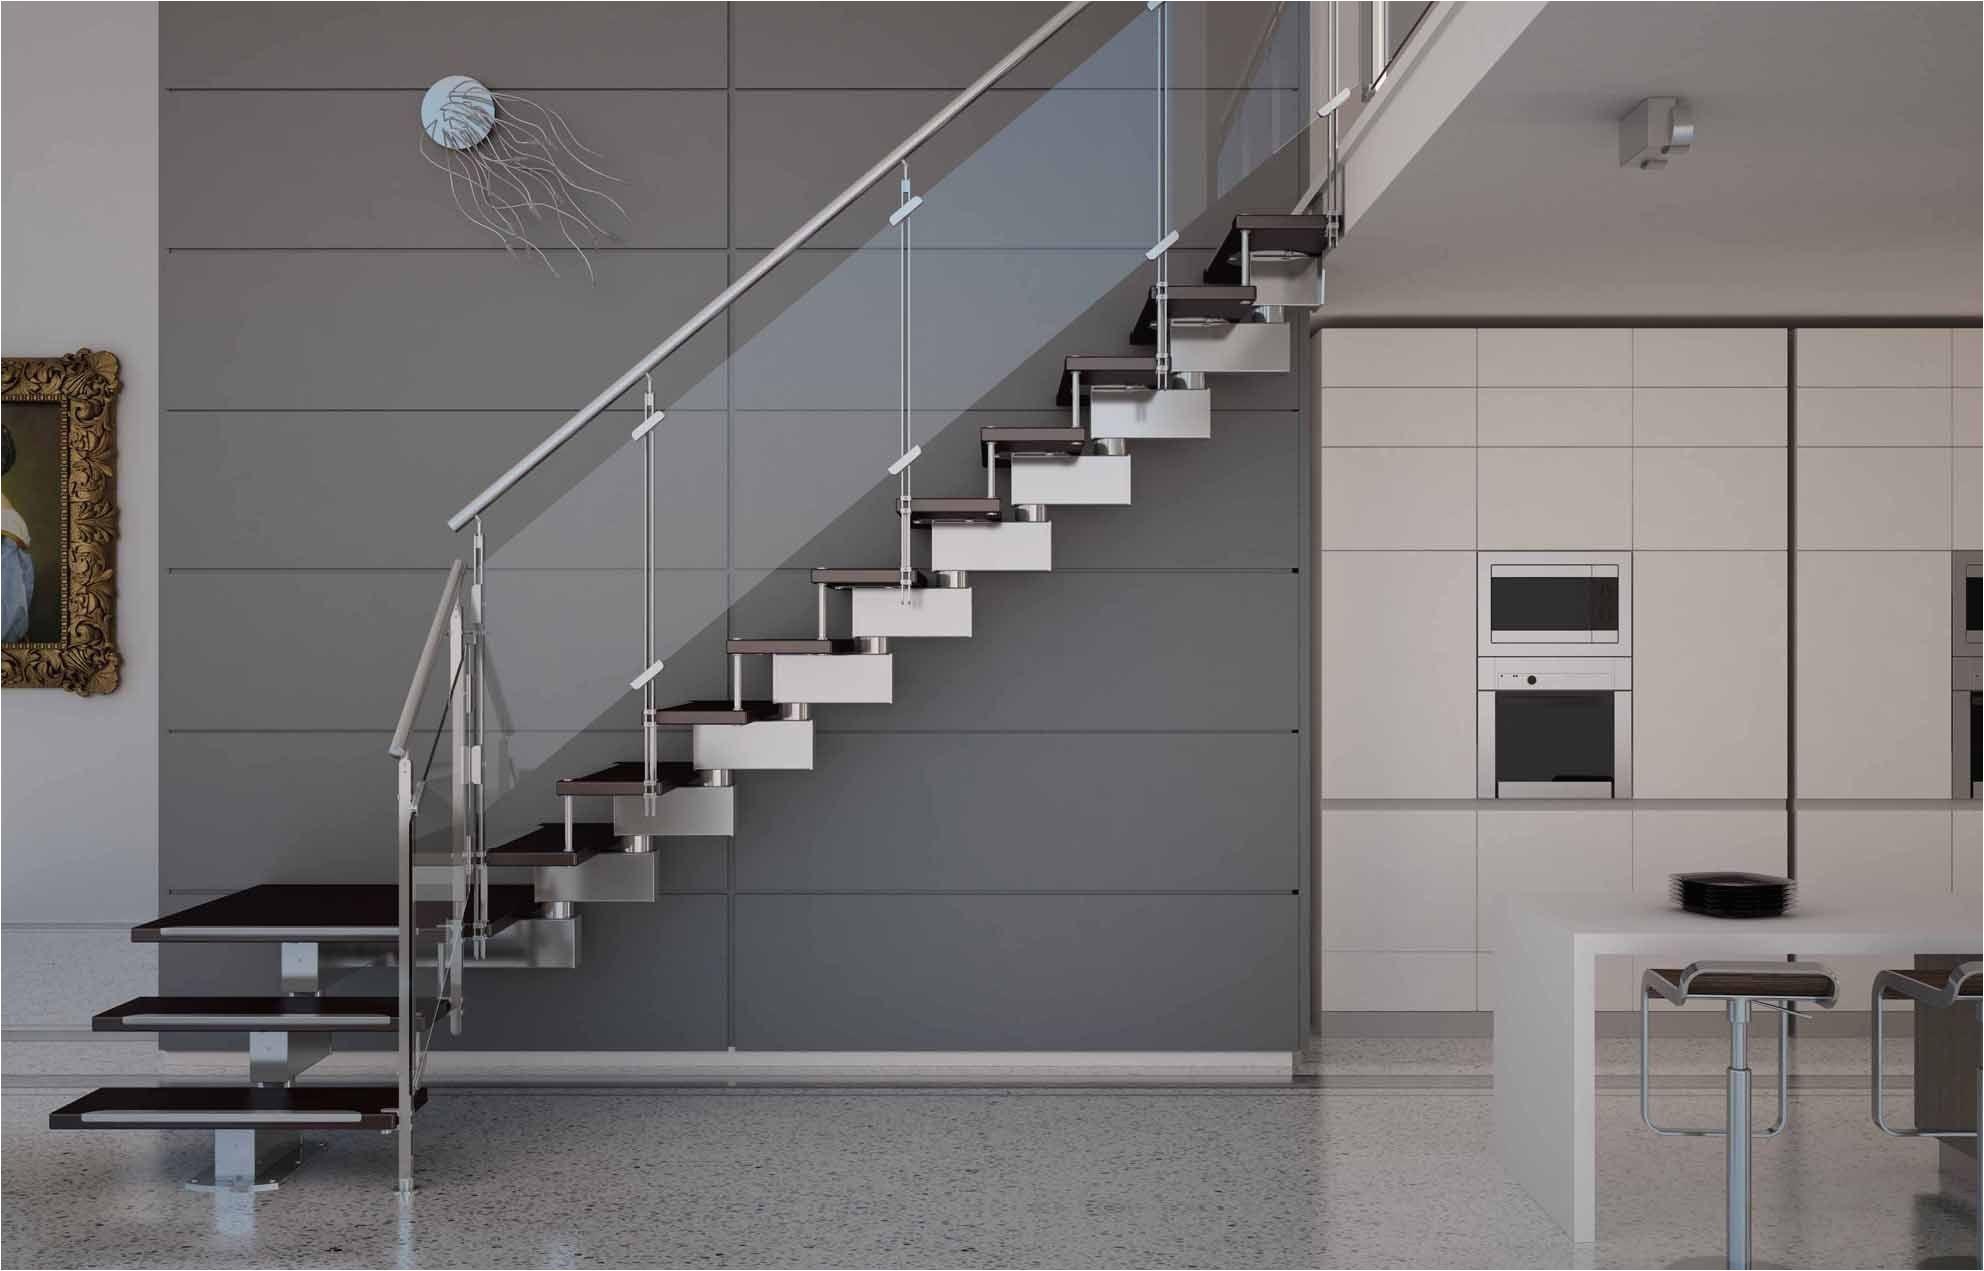 metal stair railing dubai stainless steel glass stair railings interior